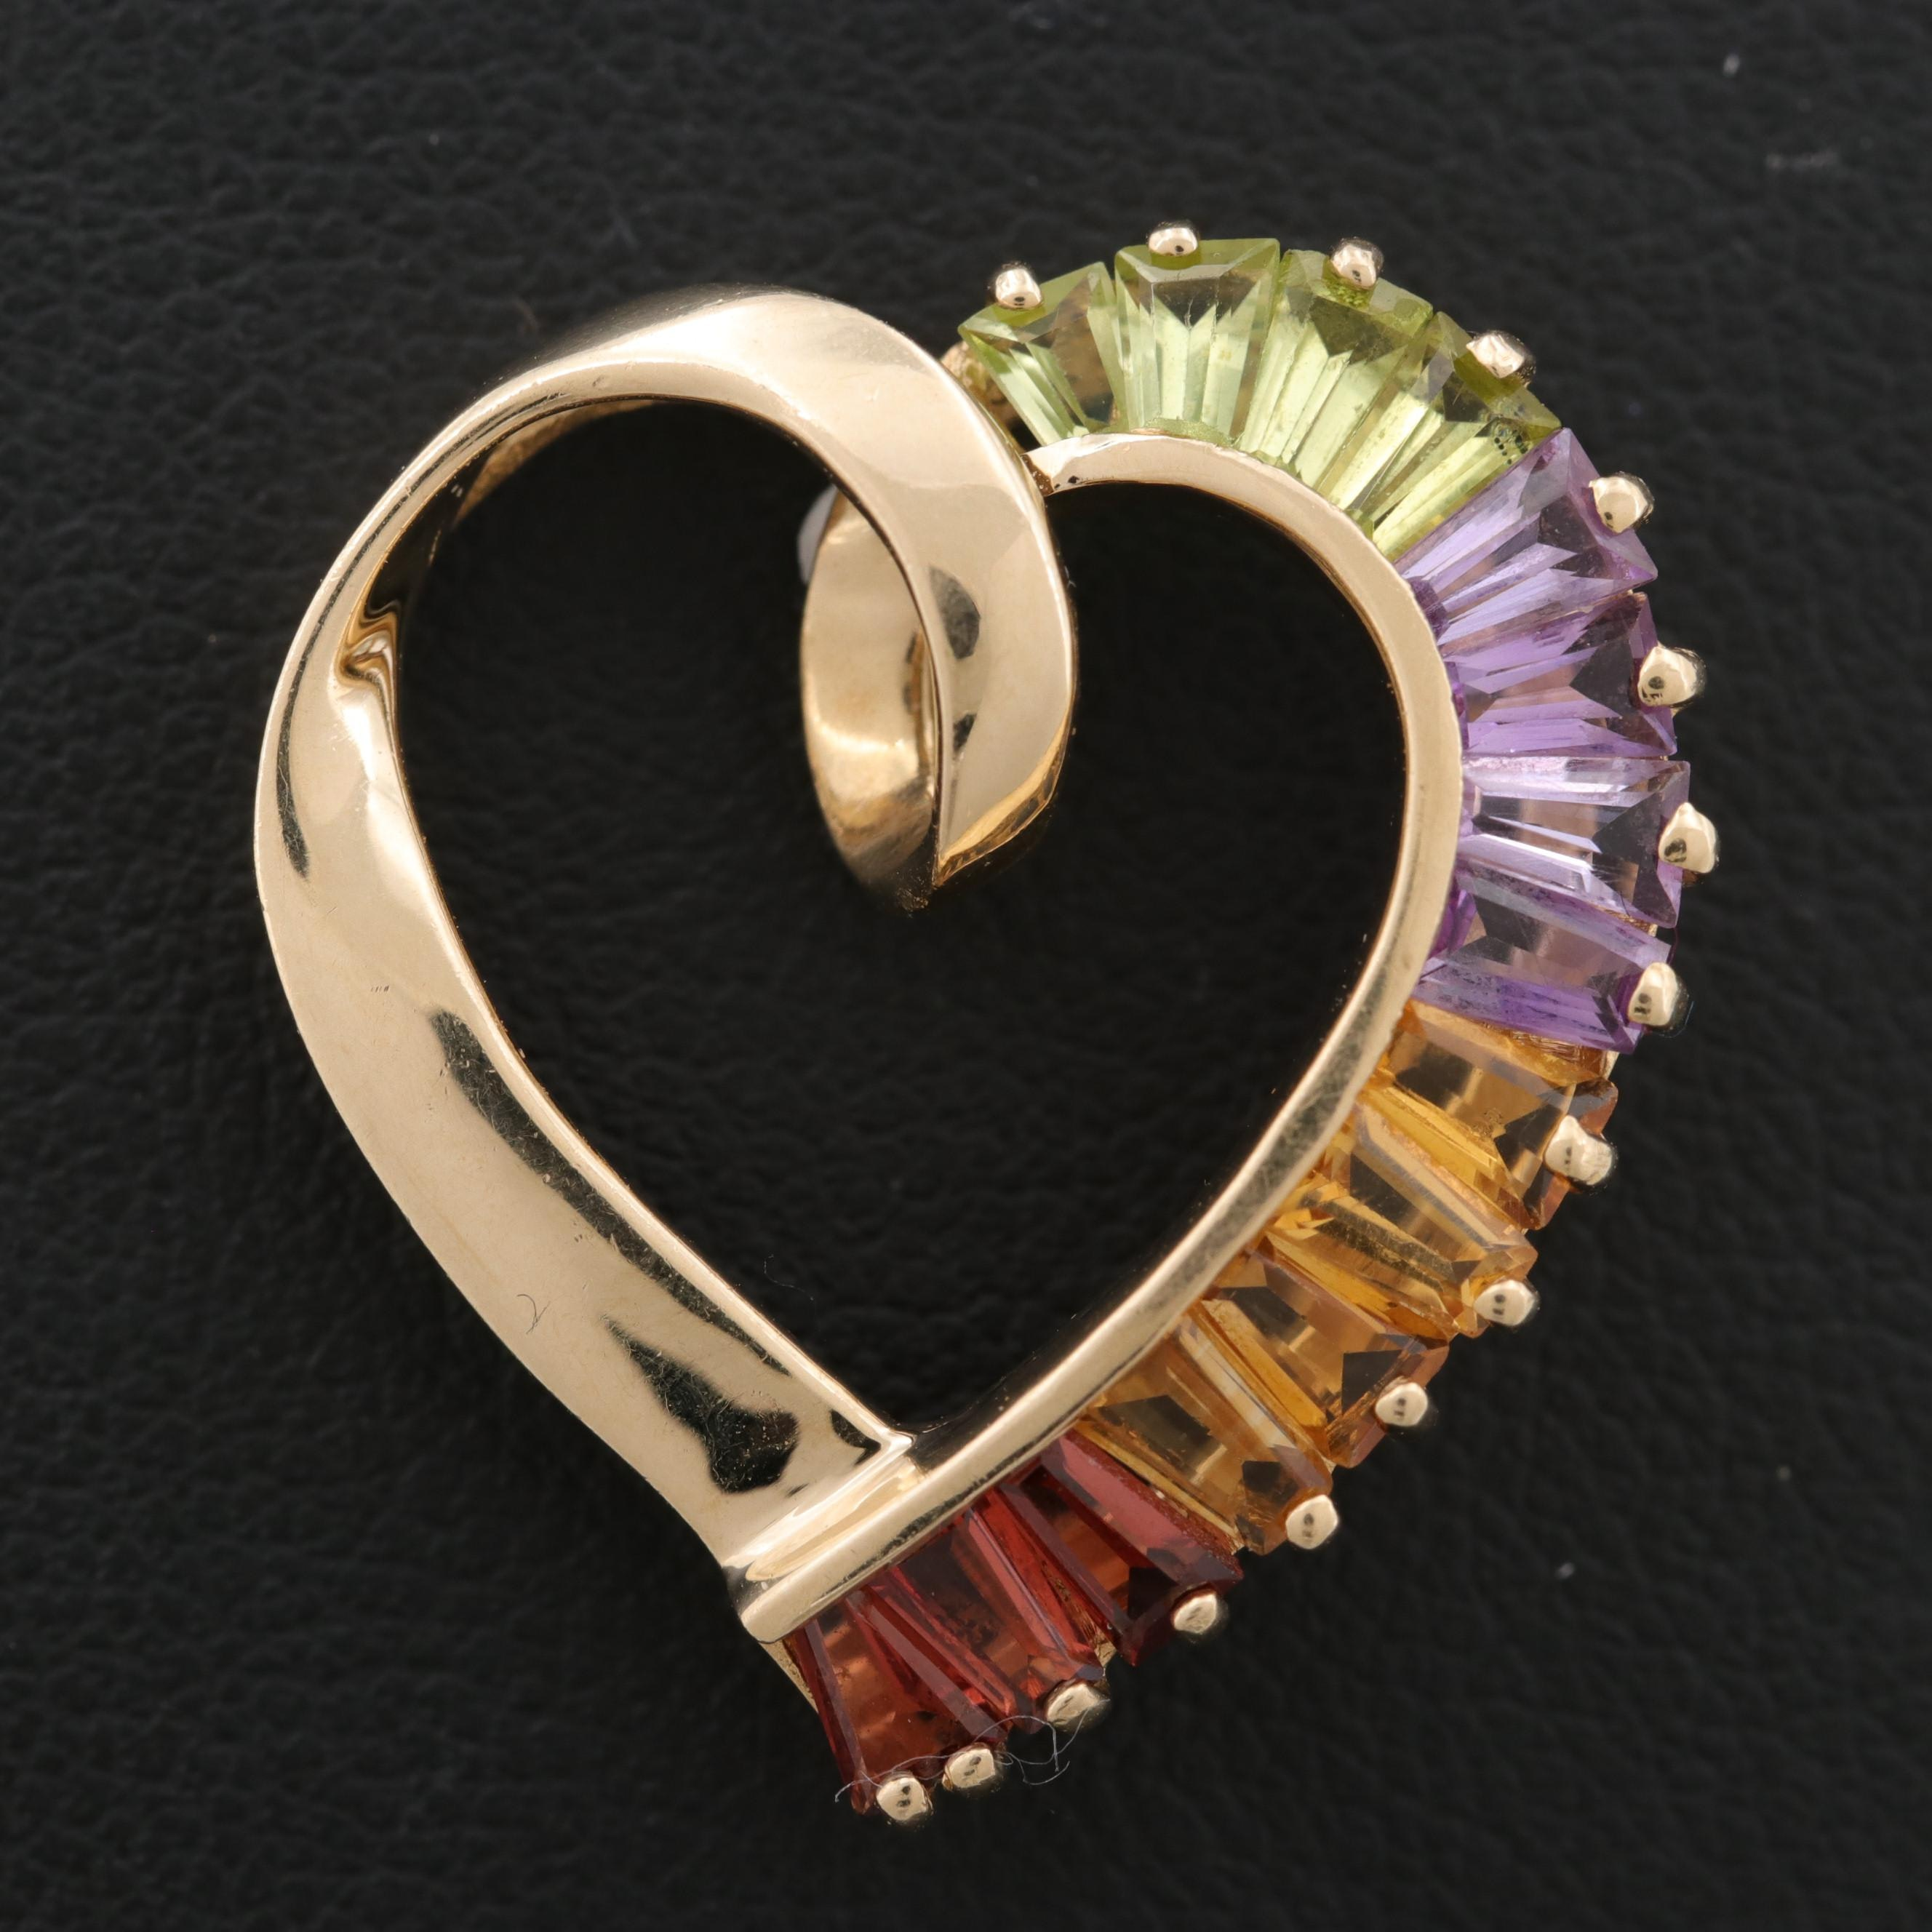 14K Yellow Gold Garnet, Citrine, Peridot, and Amethyst Heart Slide Pendant